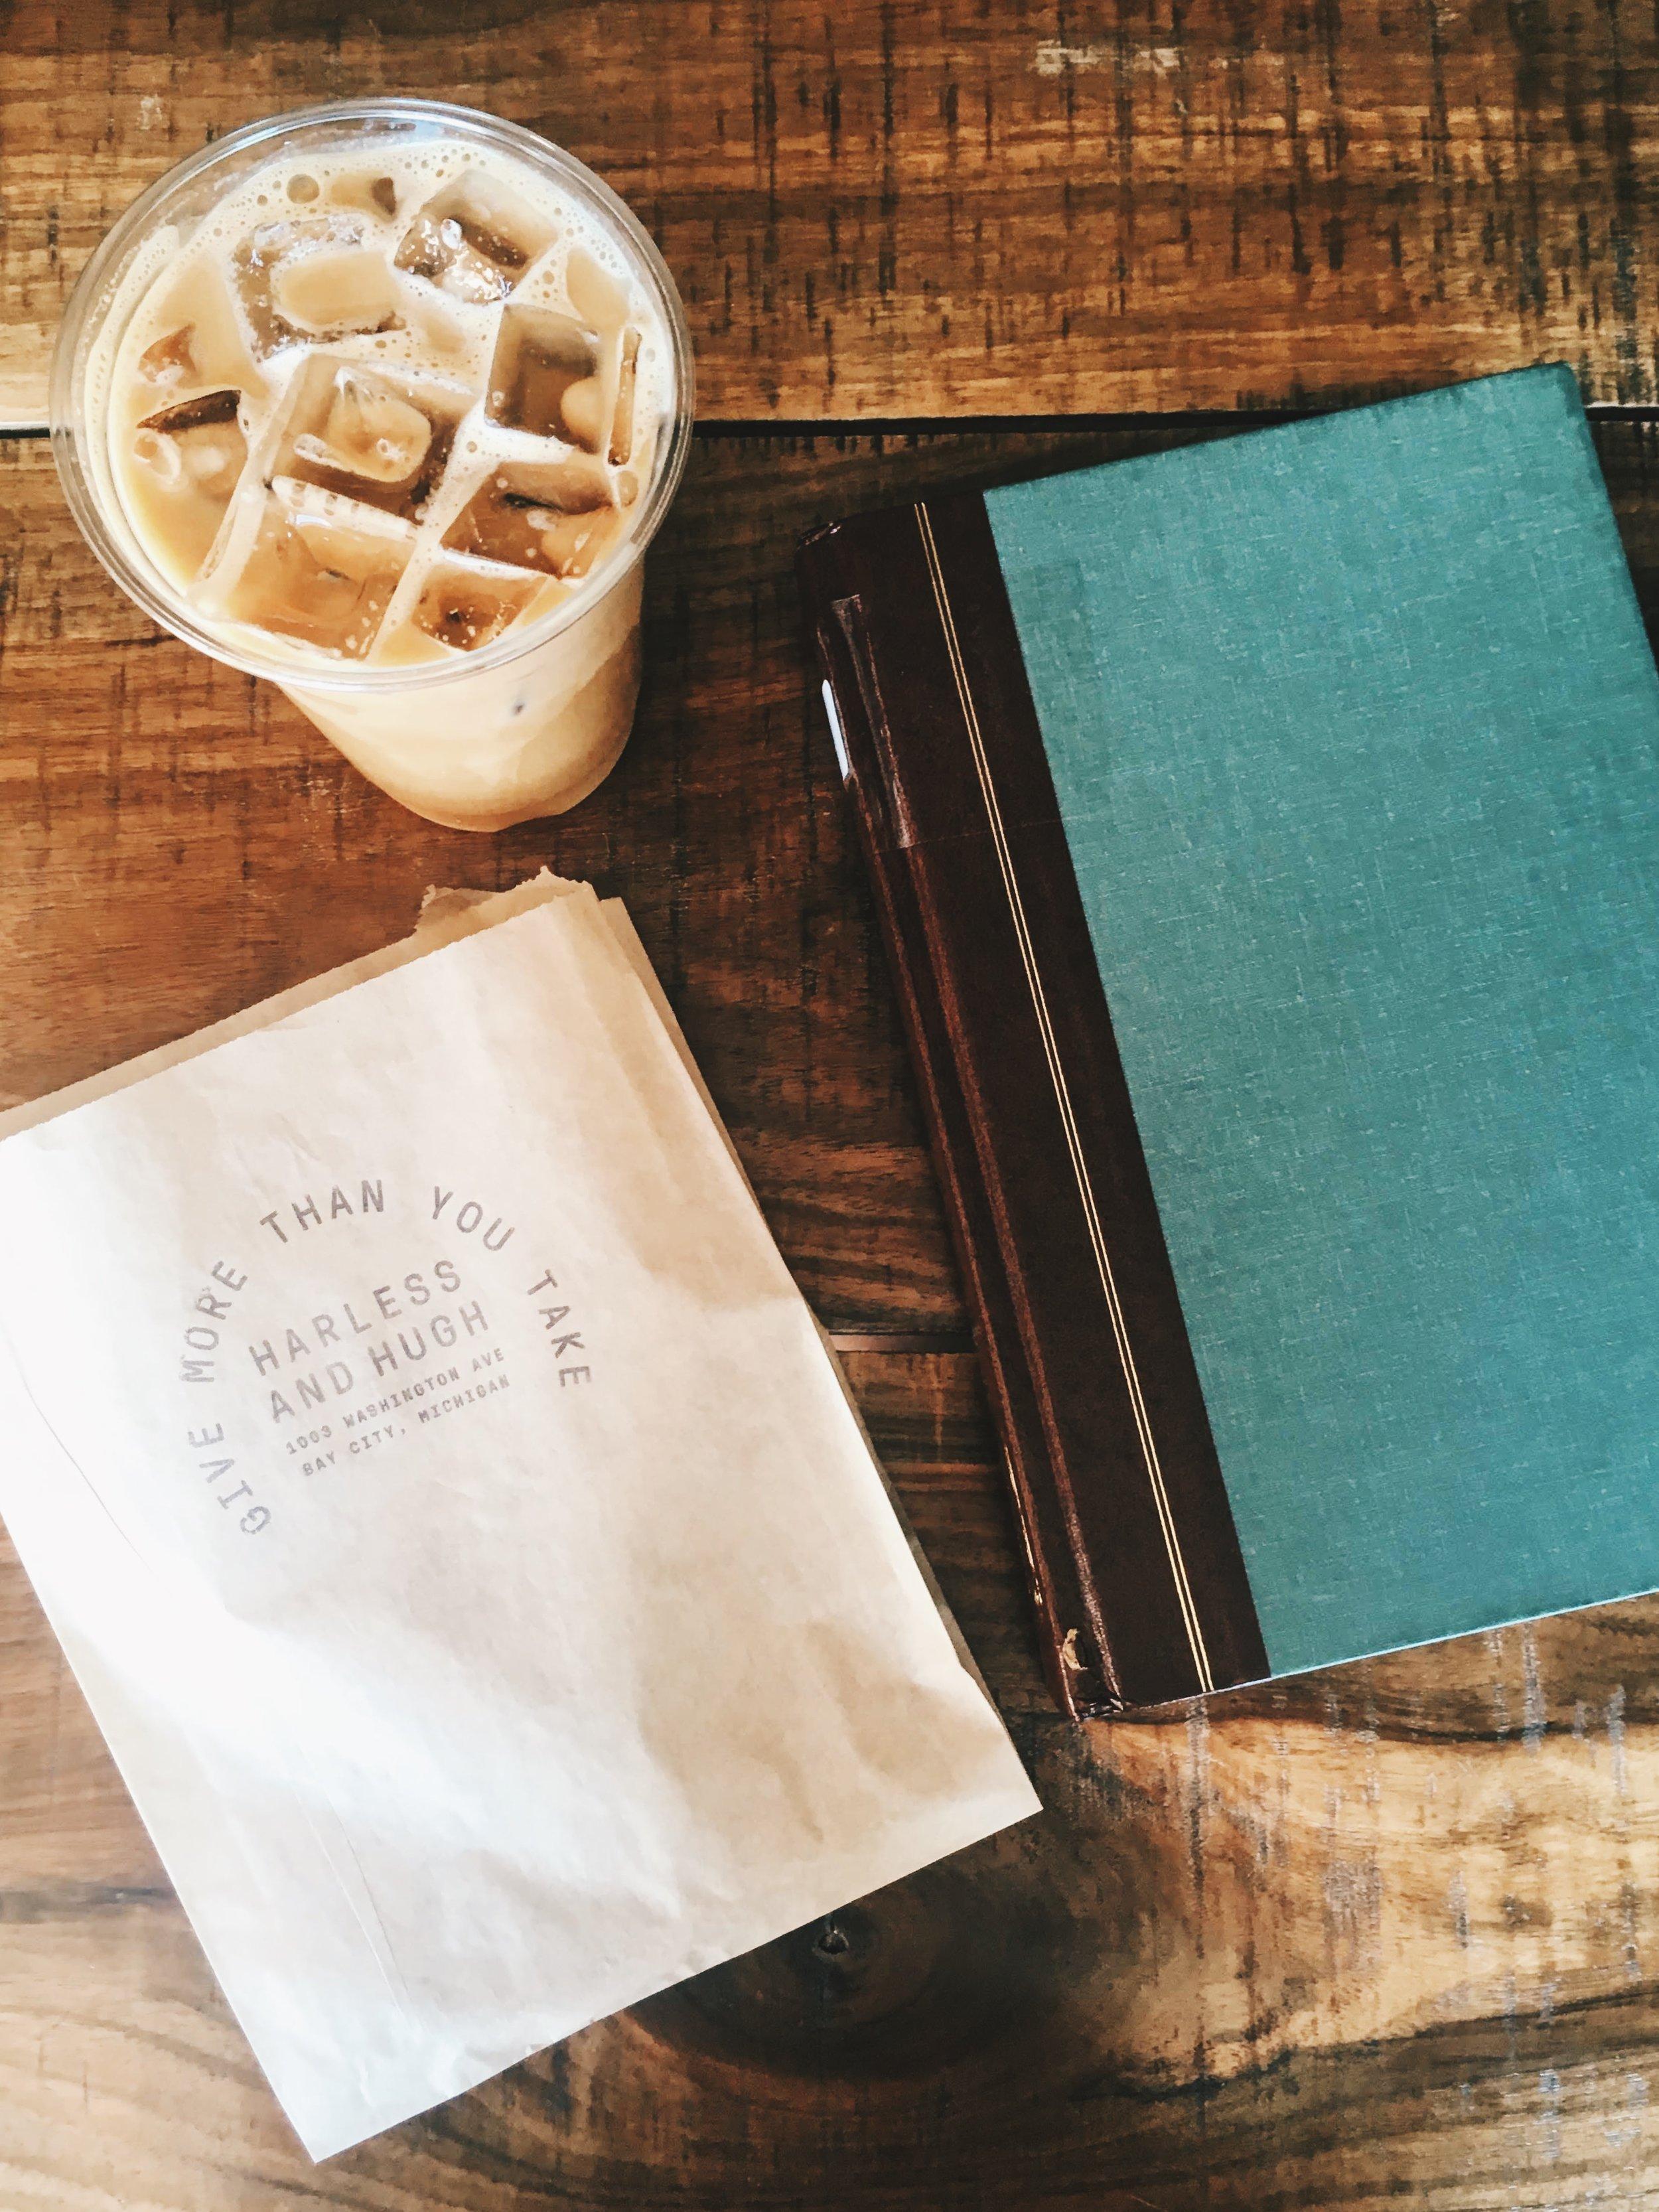 The Attic On Eighth Summer Reads M A McCuen Books Coffee.jpg